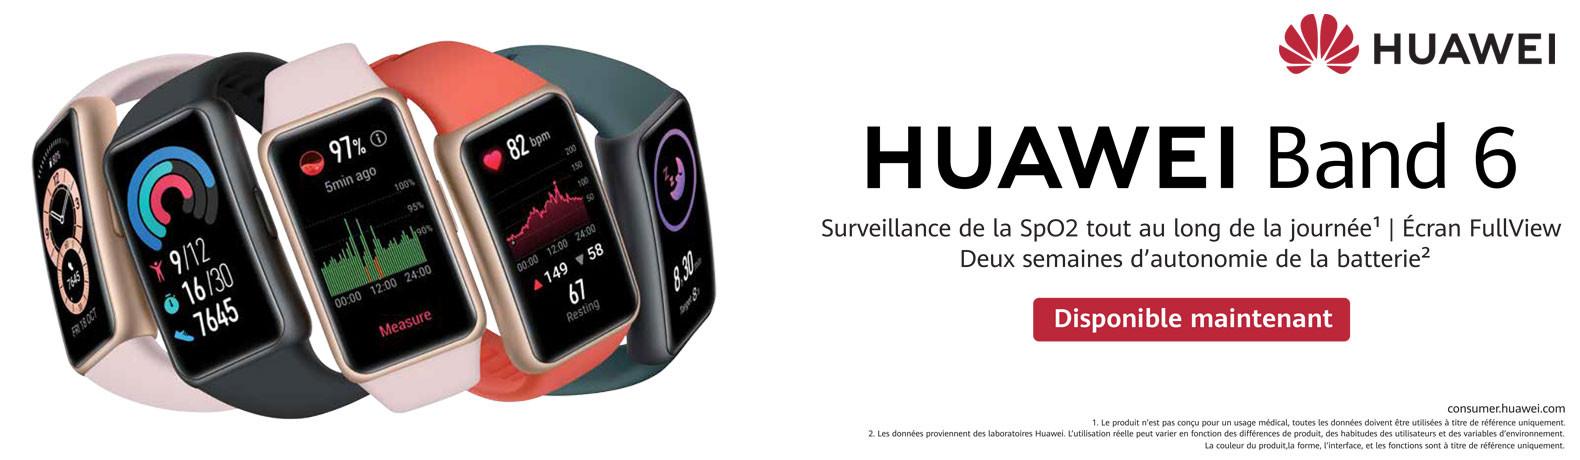 Smartwatch Tunisie Huawei